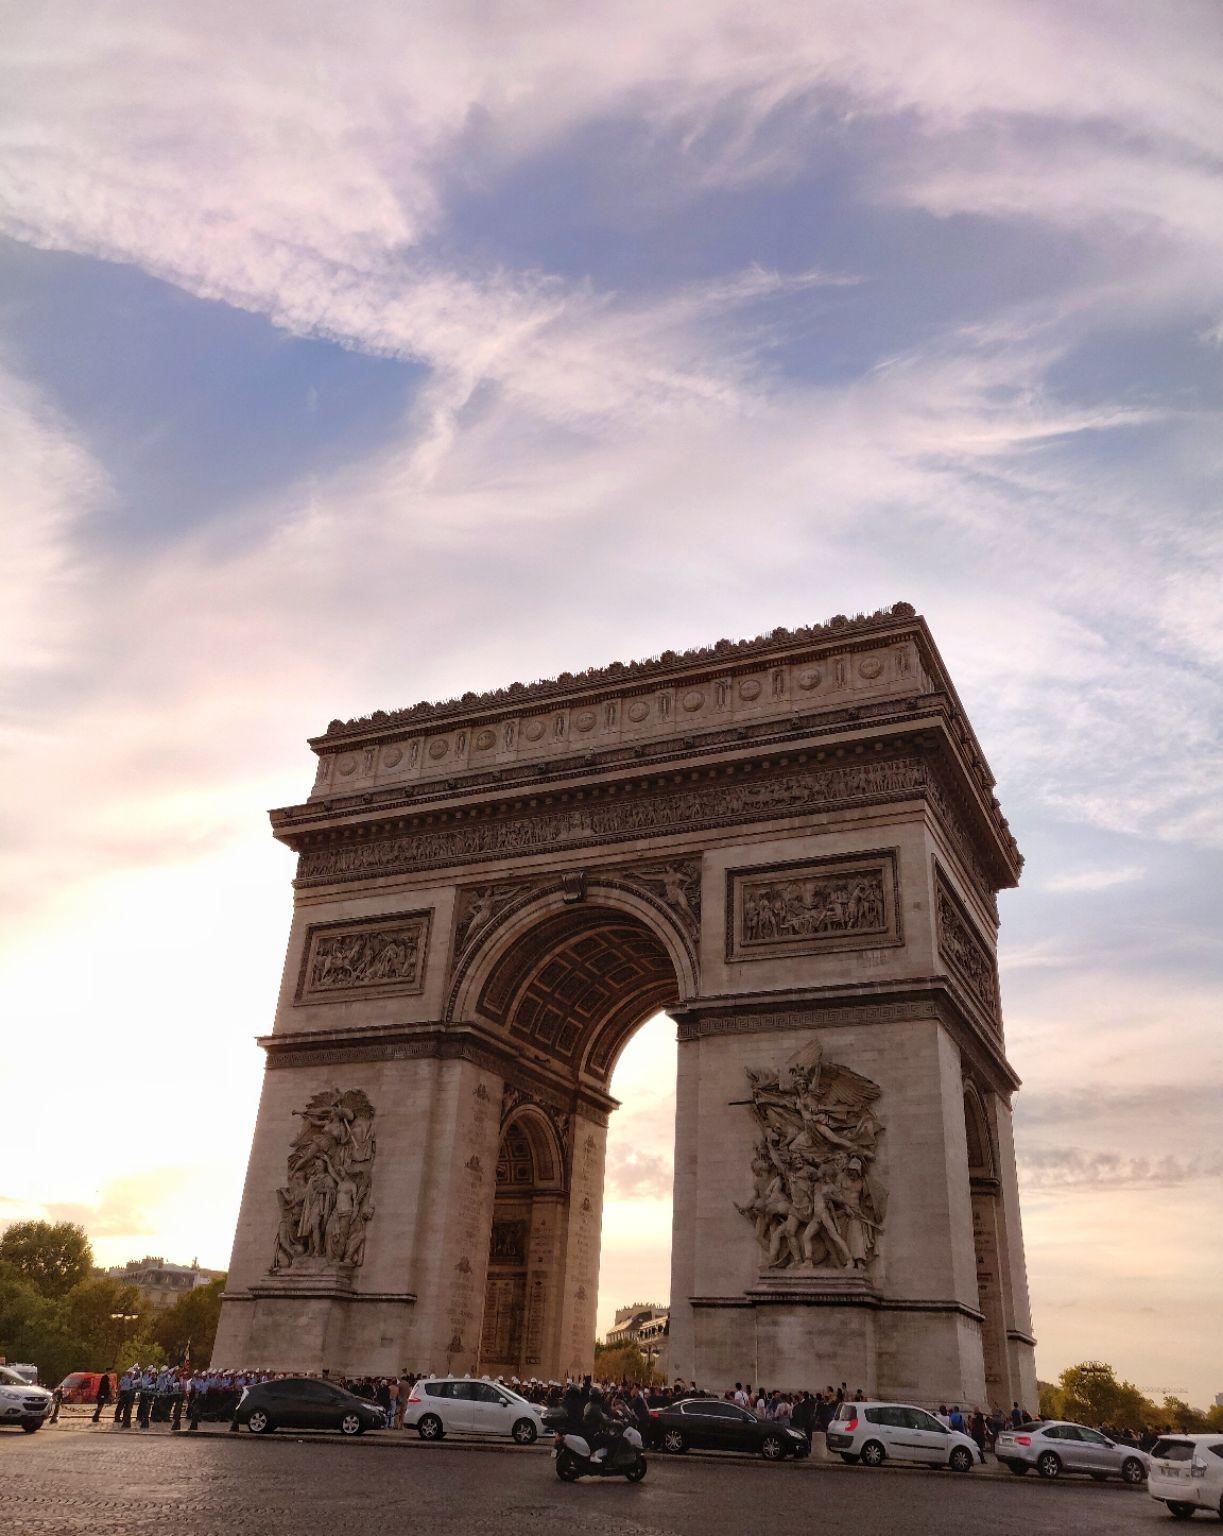 Photo of Paris By Sourabh Manna